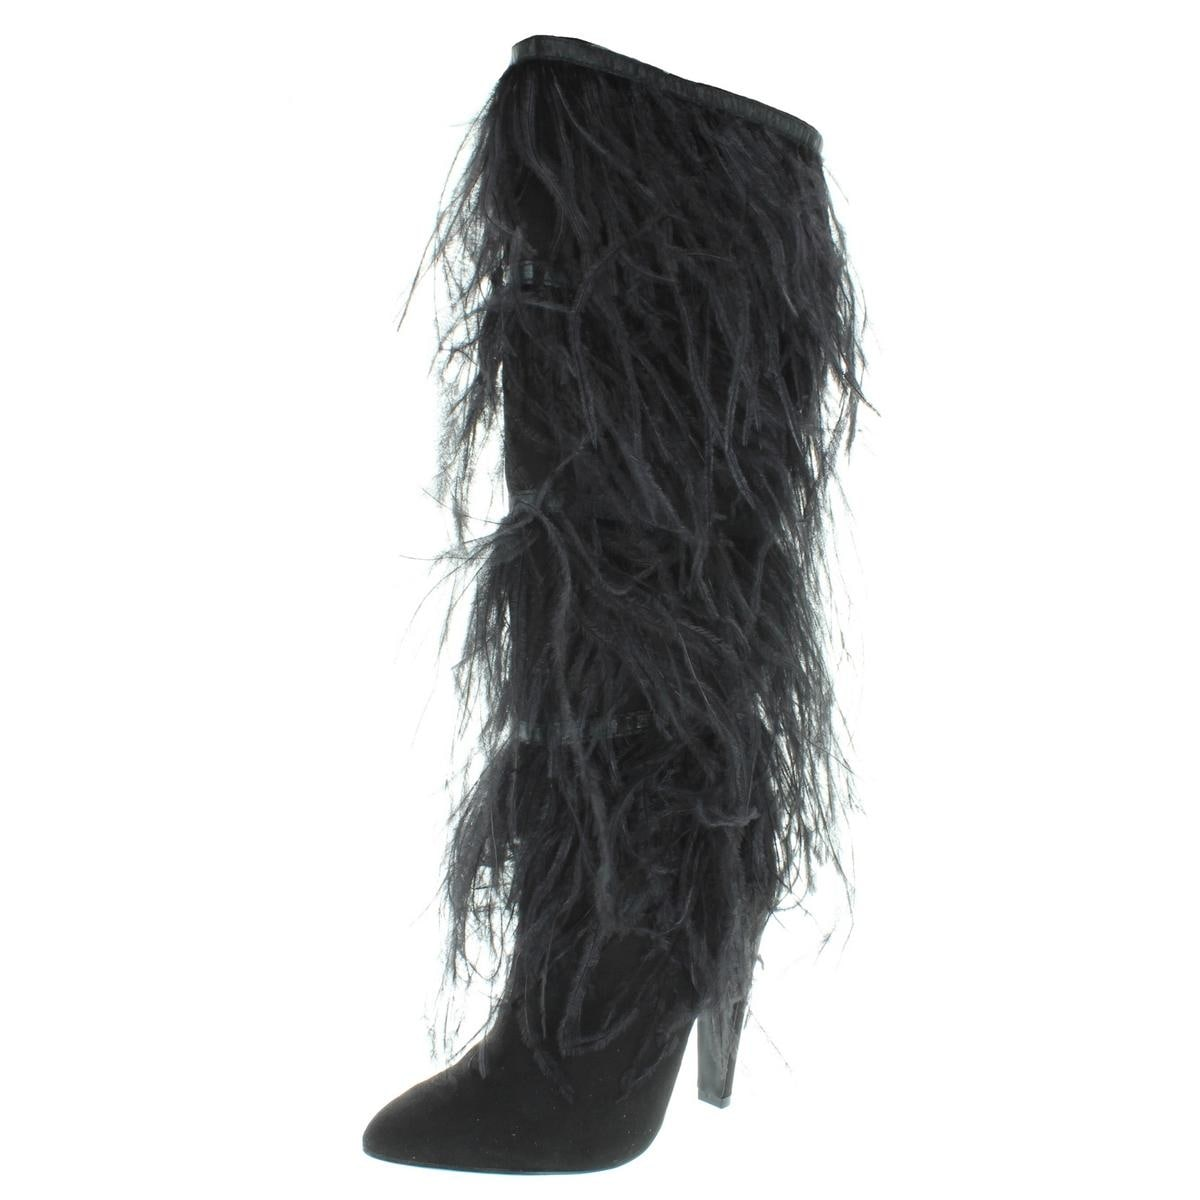 a10e9fe7720 Shop Steve Madden Womens Alesandra Dress Boots Feathers Knee-High ...